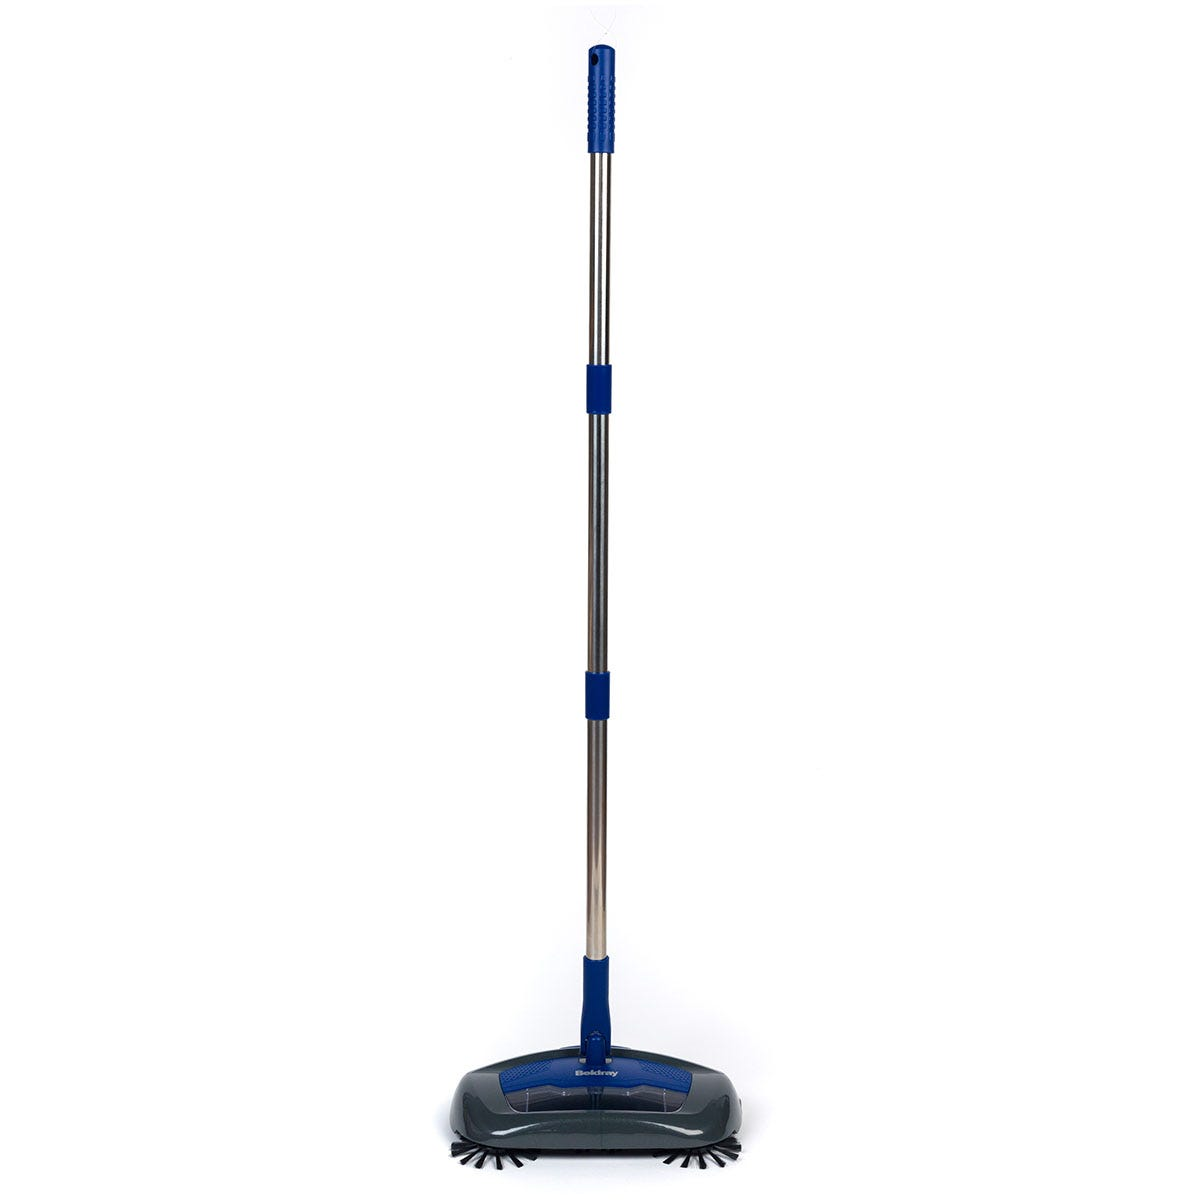 Beldray Cordless Rechargeable Floor Sweeper - Blue